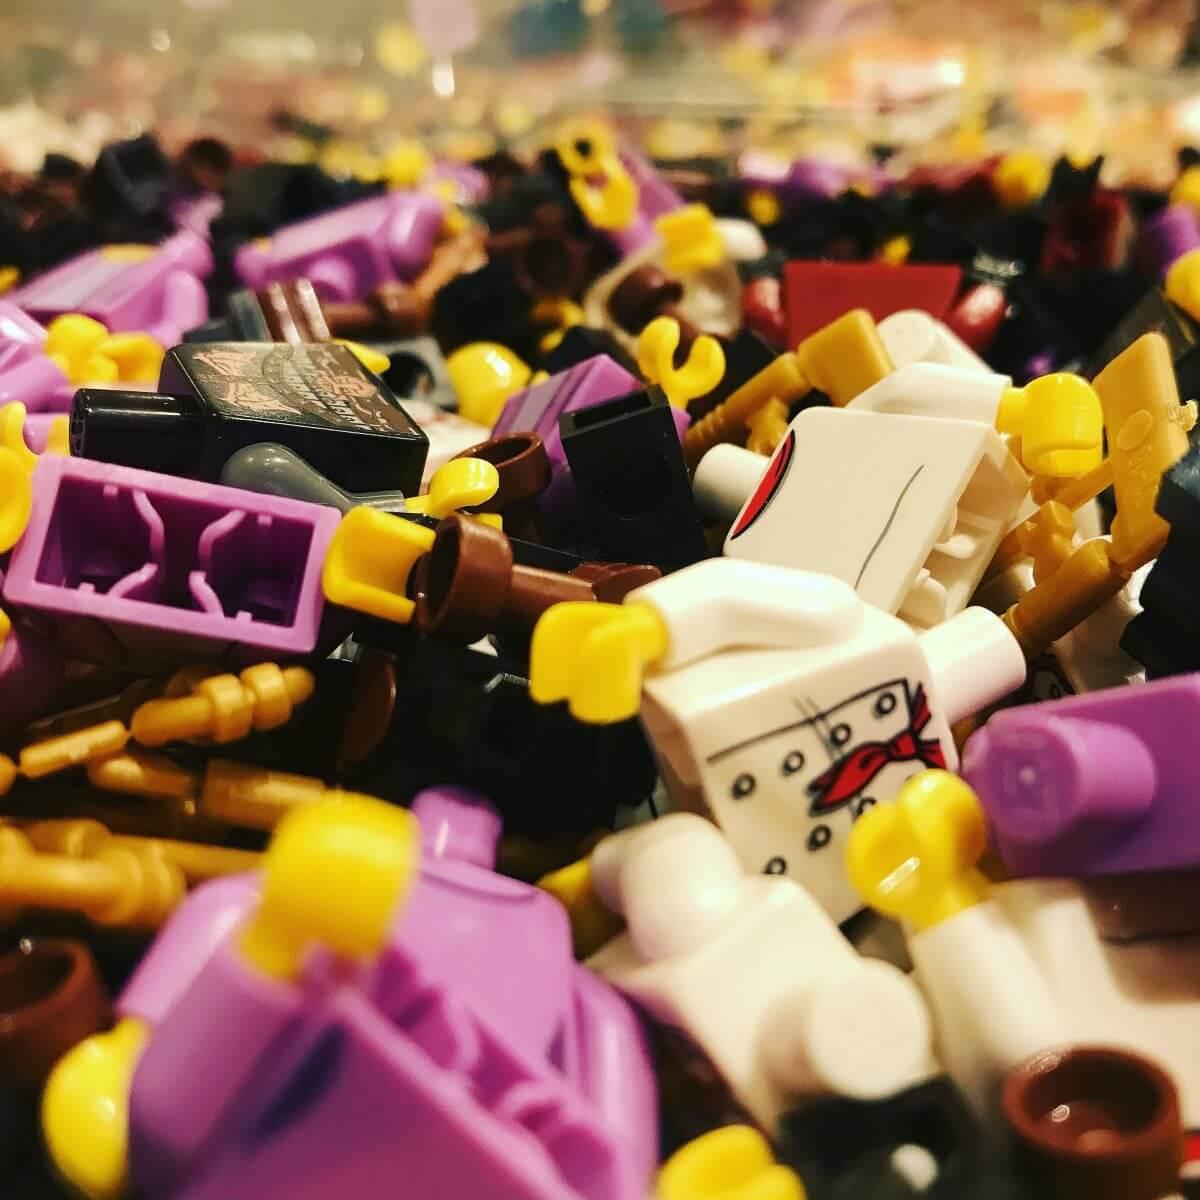 LEGO House vlakbij Legoland Billund